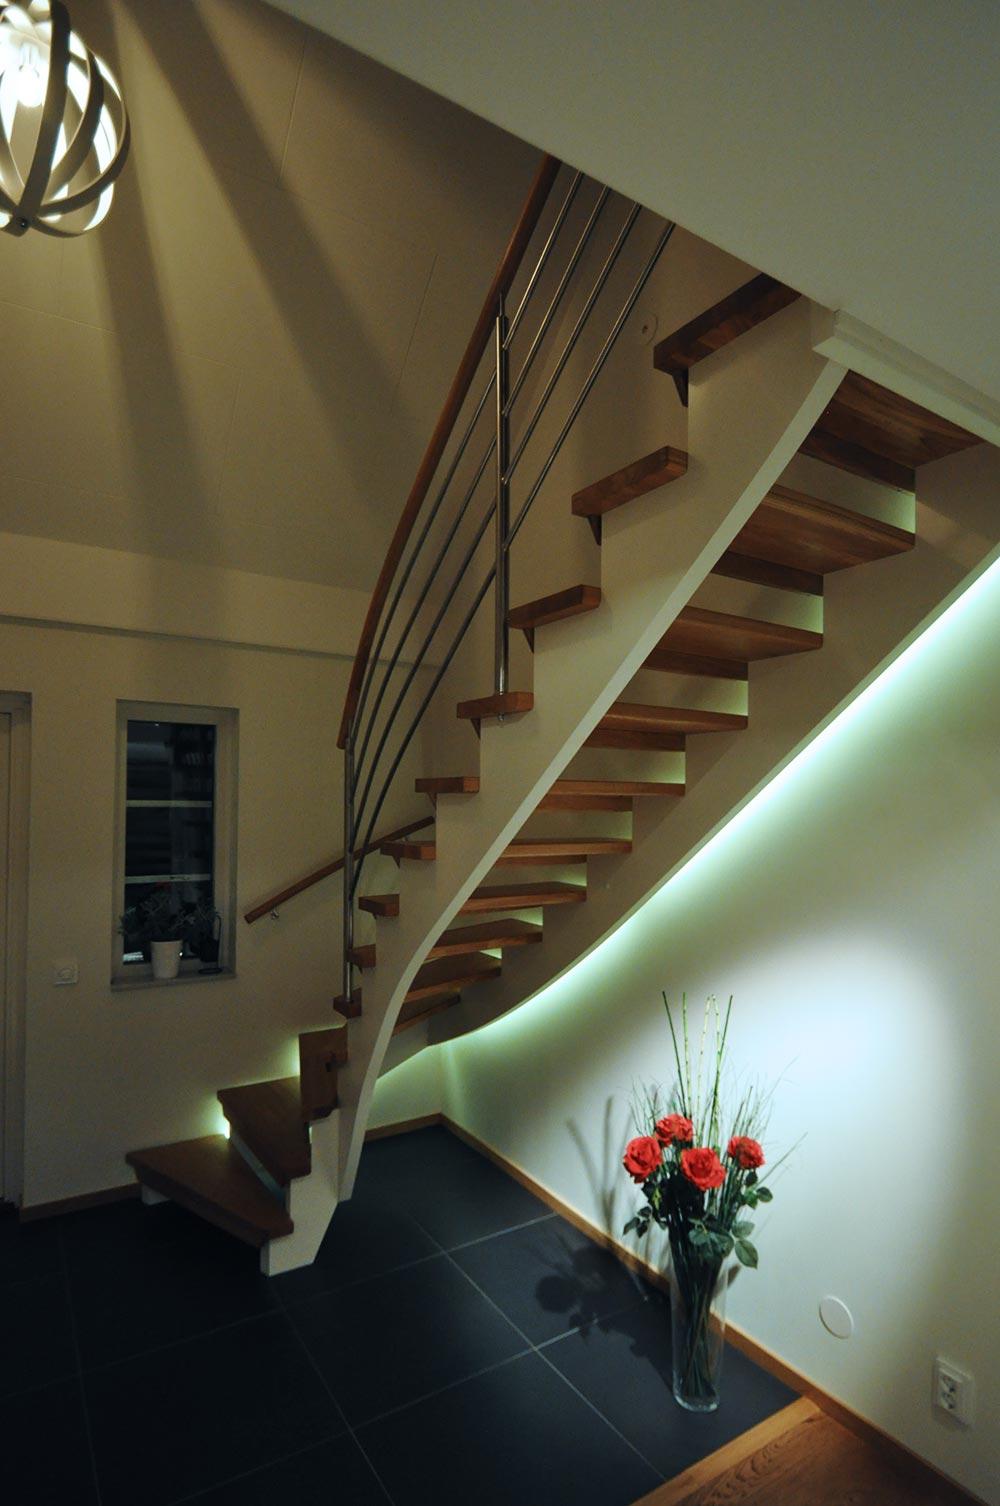 En vit trappa med trappbelysning.